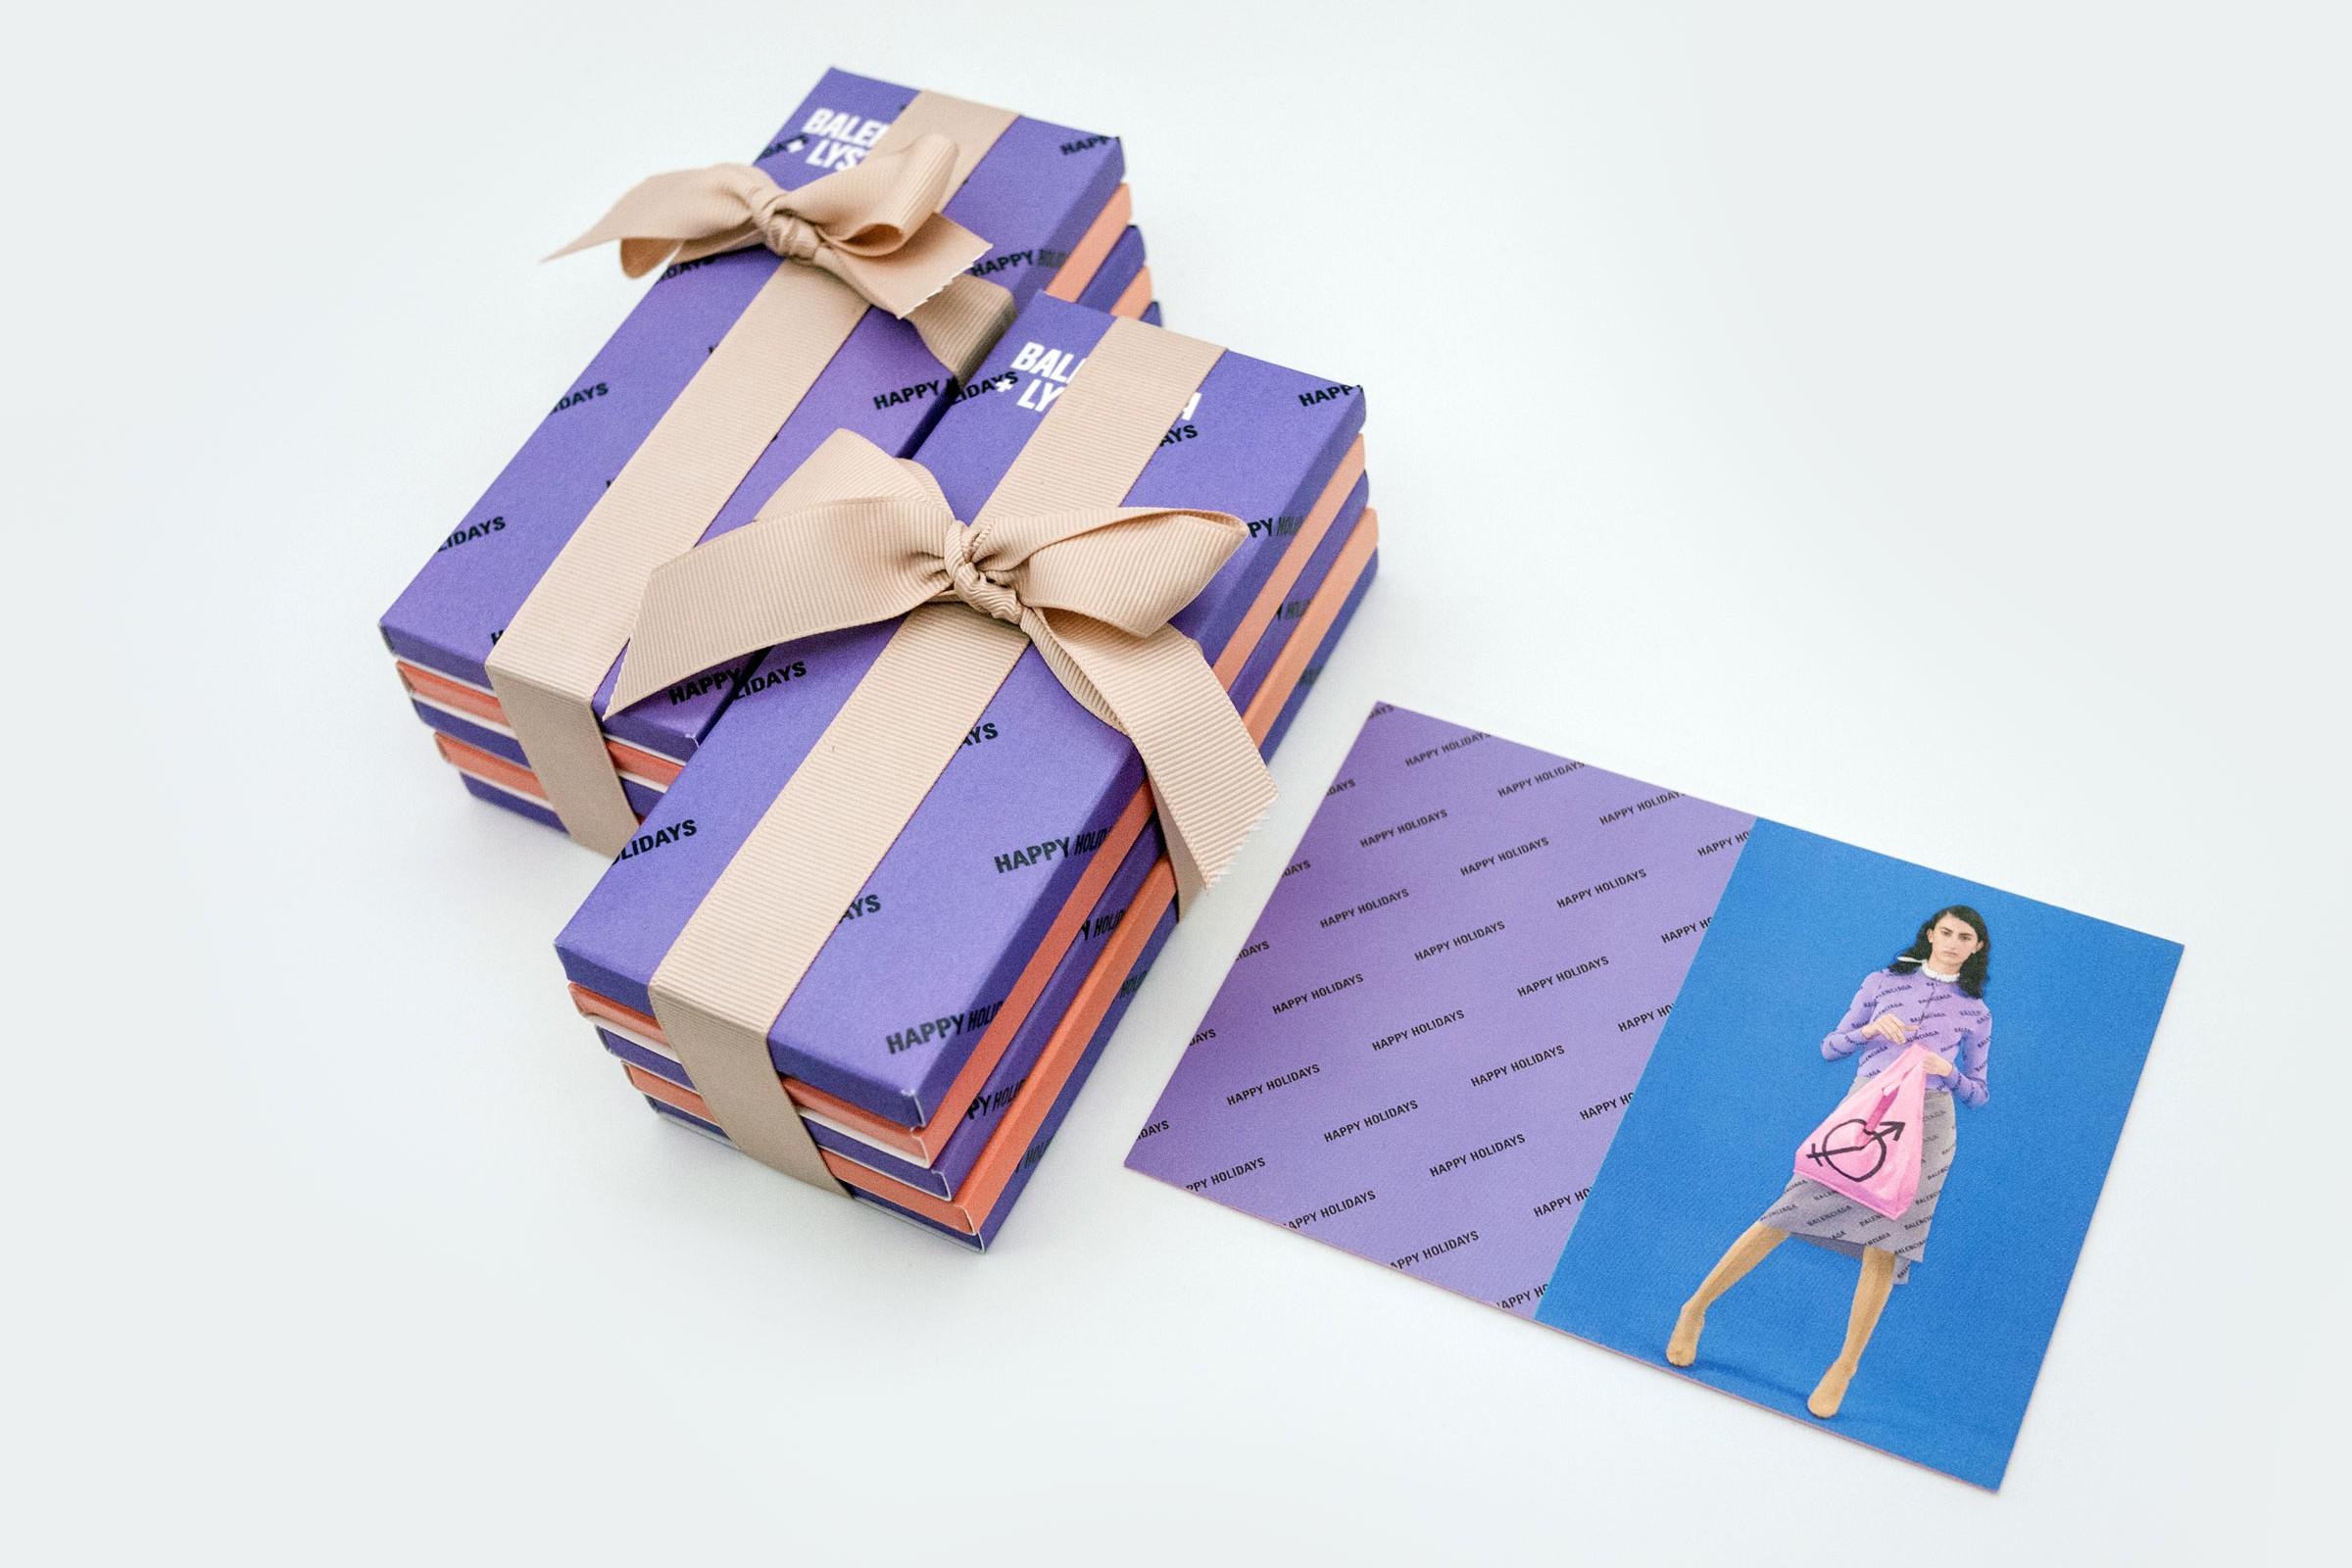 Balenciaga inspired chocolate bars by Lyst